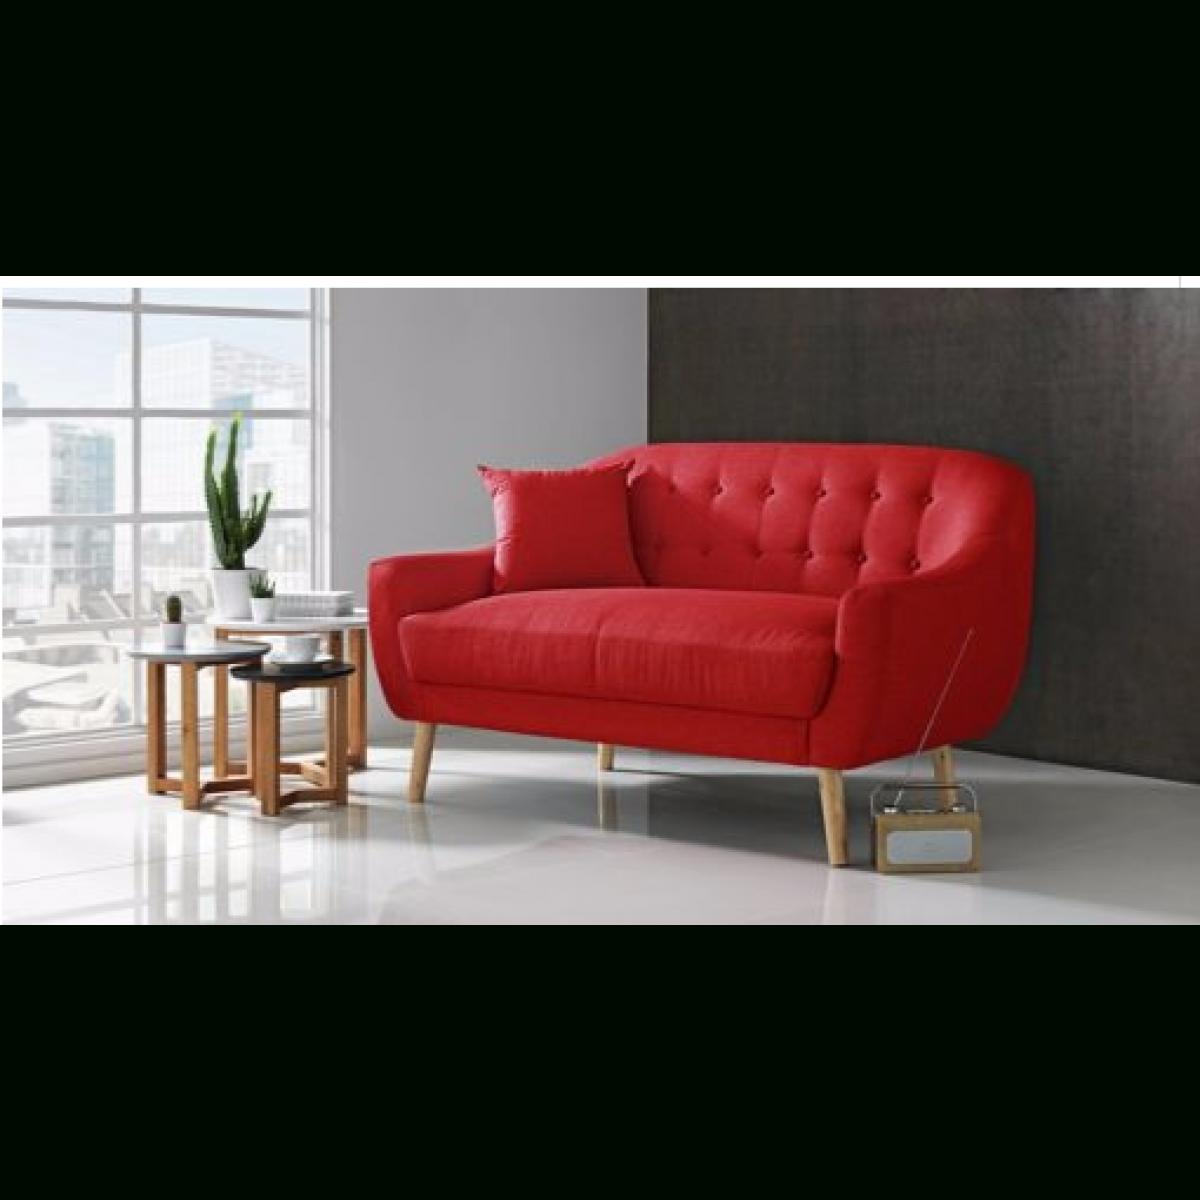 Hygena Lexie Retro Compact Fabric 2 Seater Sofa – Poppy Red For Retro Sofas (View 3 of 10)